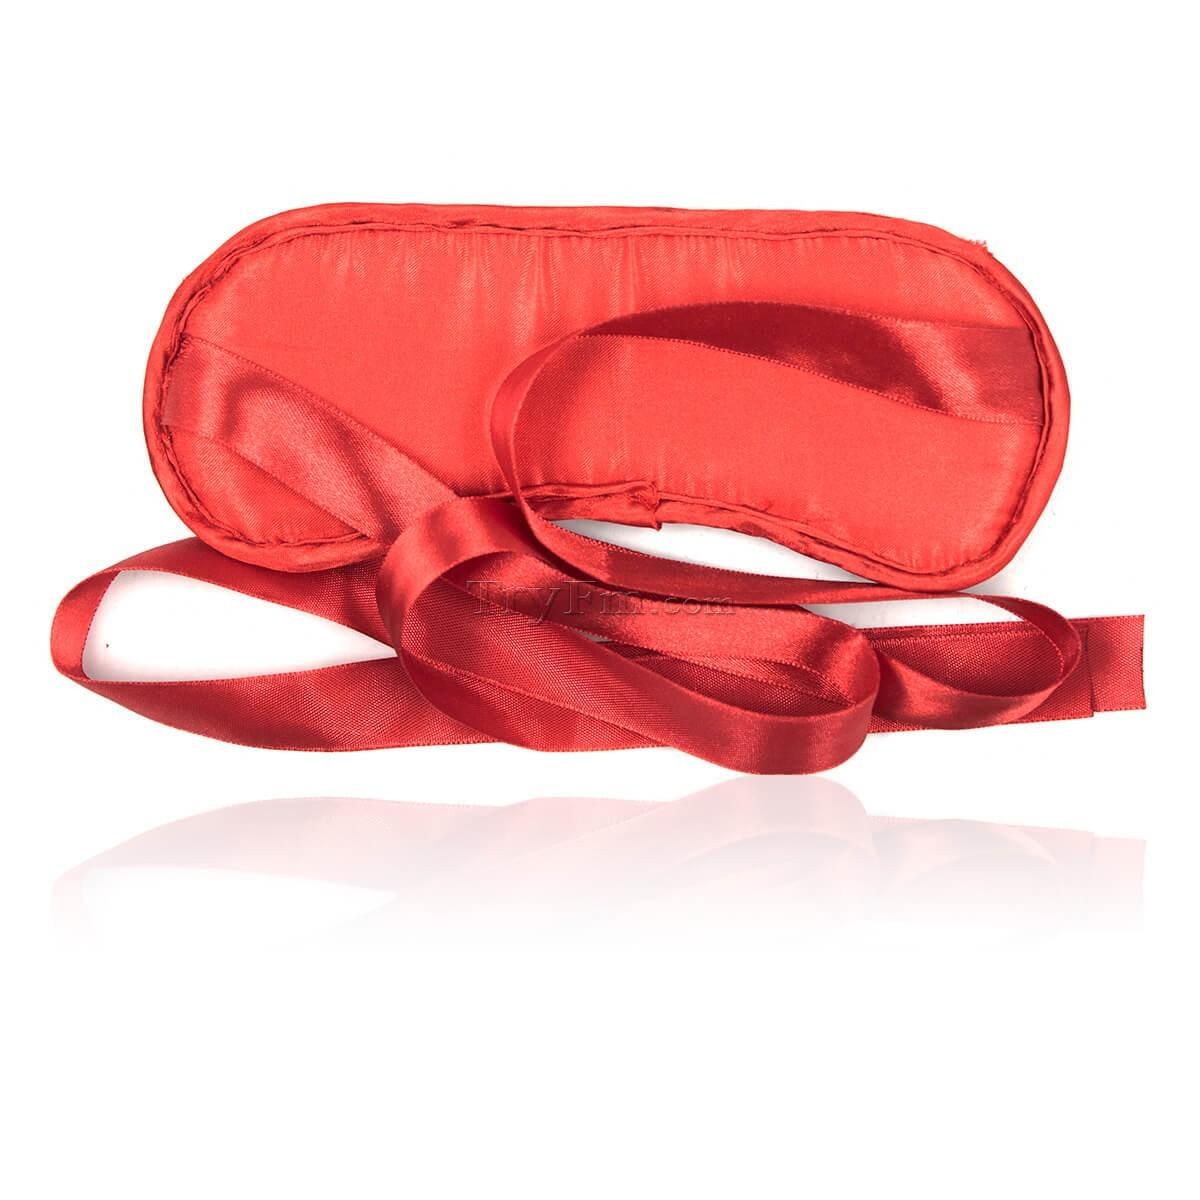 1-american-beauty-blindfold7.jpg